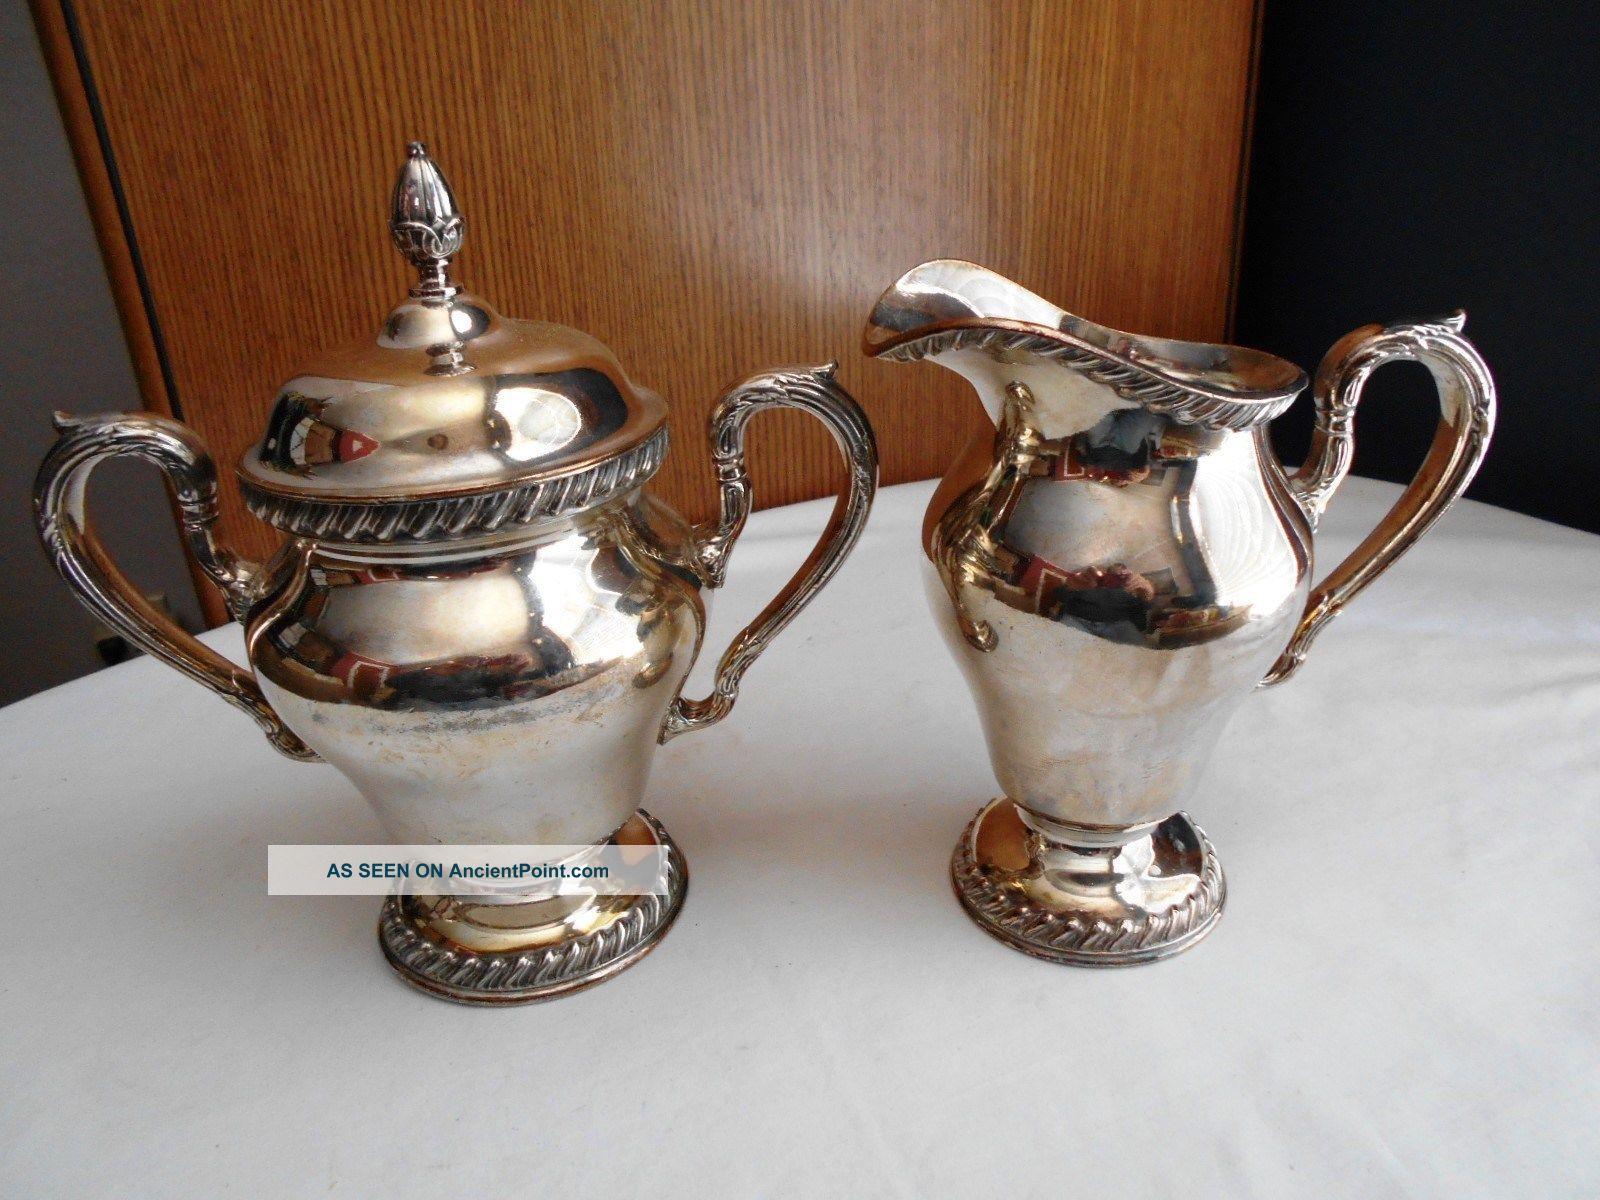 Vintage Wilcox International Silverplated Creamer Pitcher & Sugar Bowl Creamers & Sugar Bowls photo